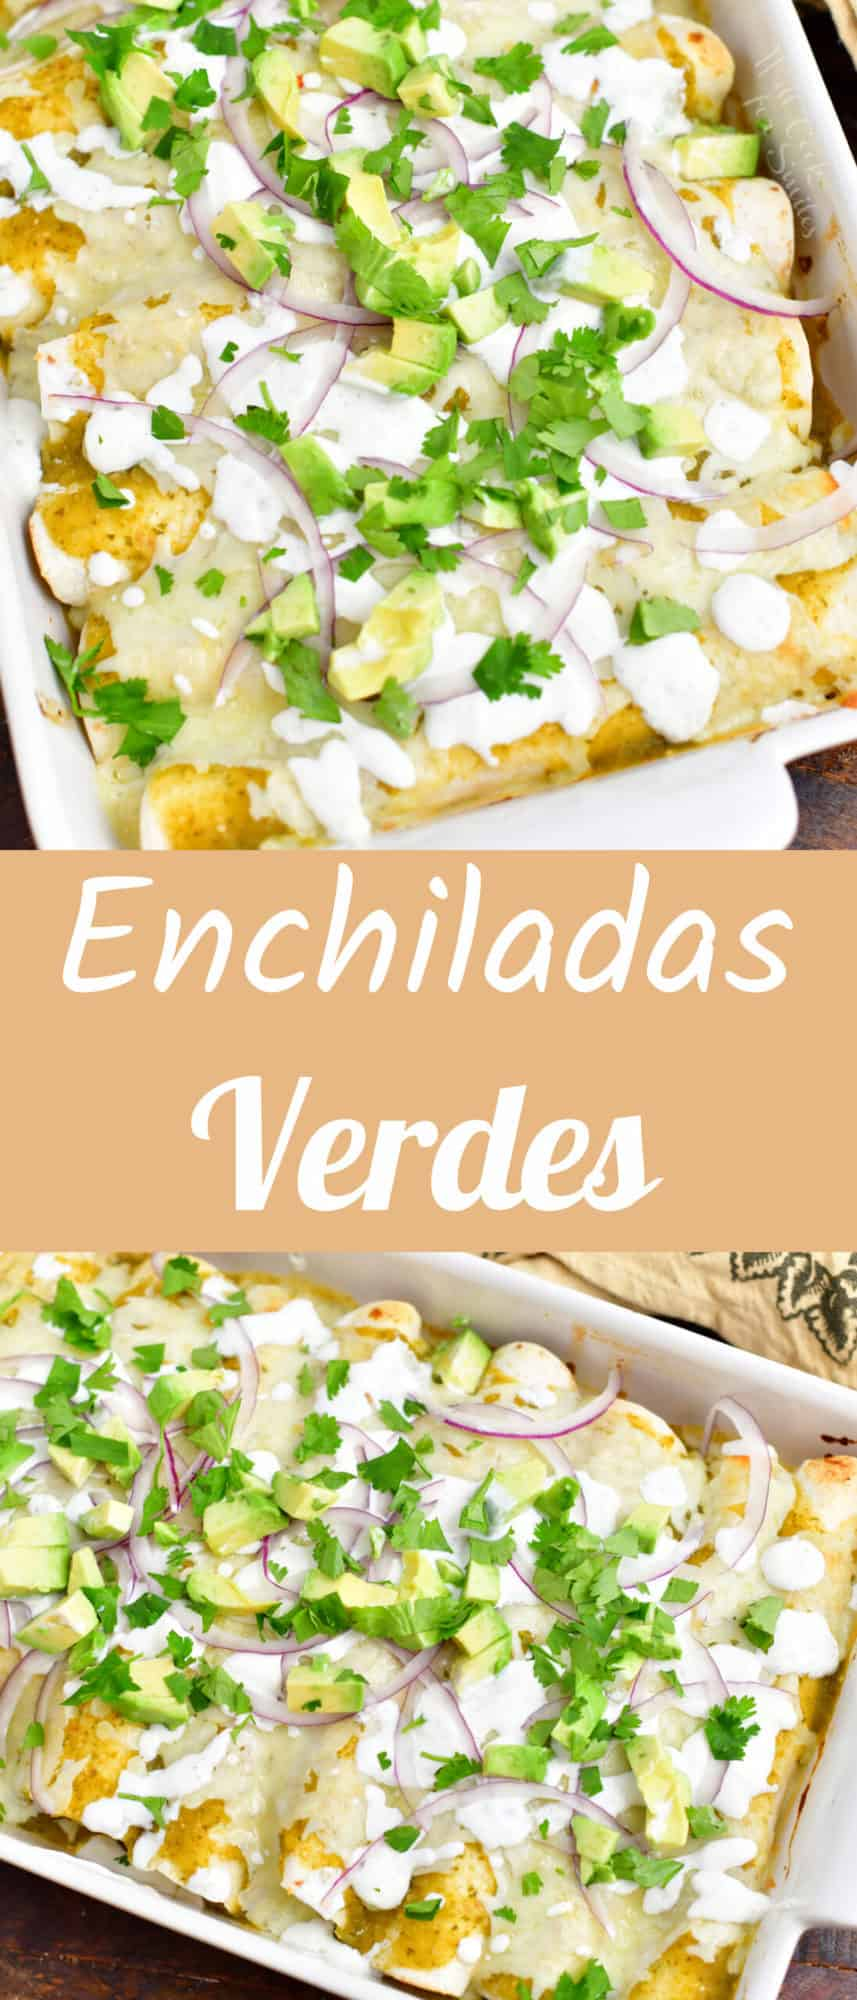 titled photo collage (and shown): enchiladas verdes